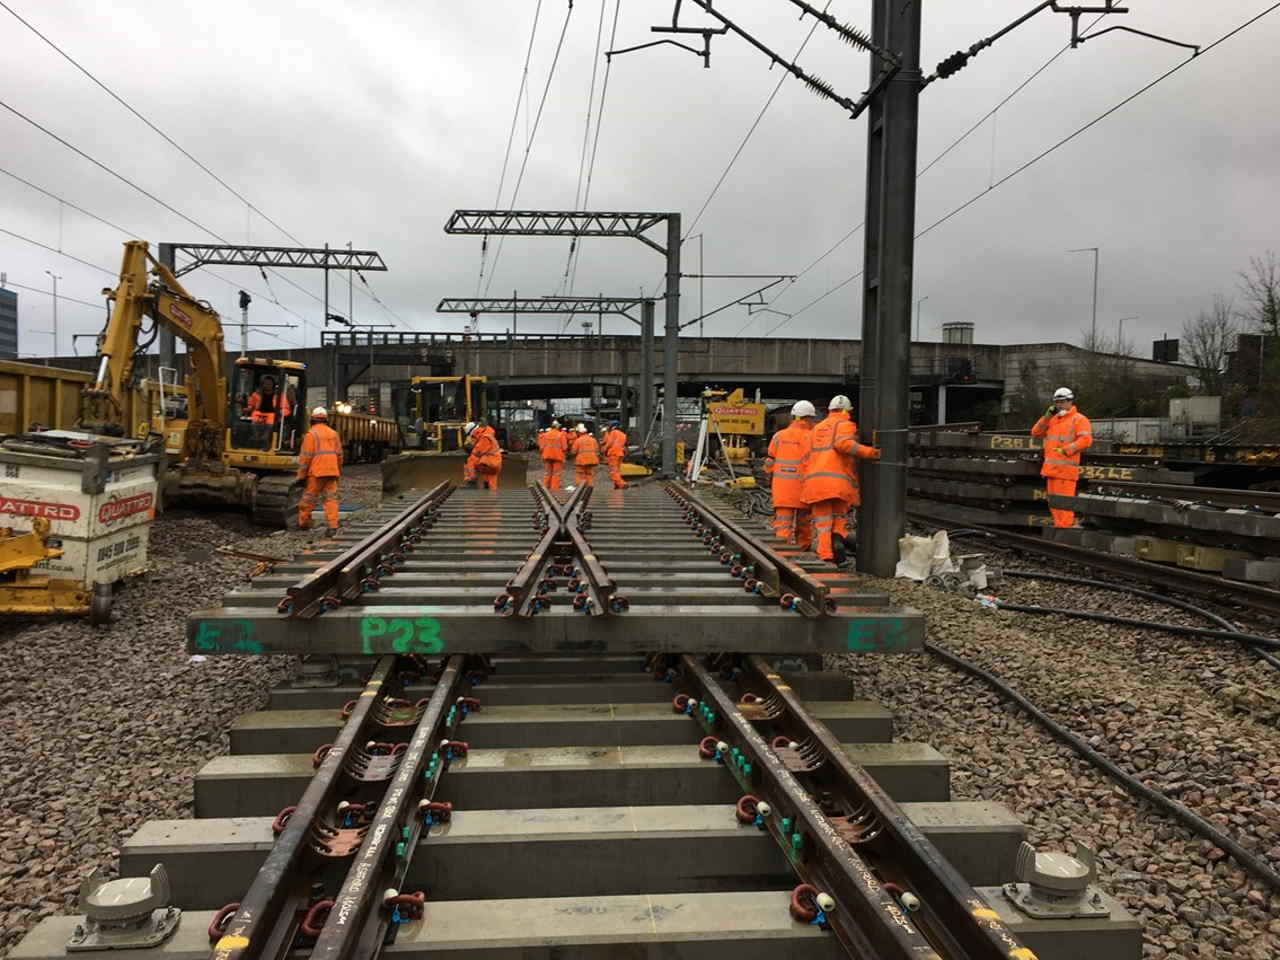 [NWR] Kent and South East London railway renewed